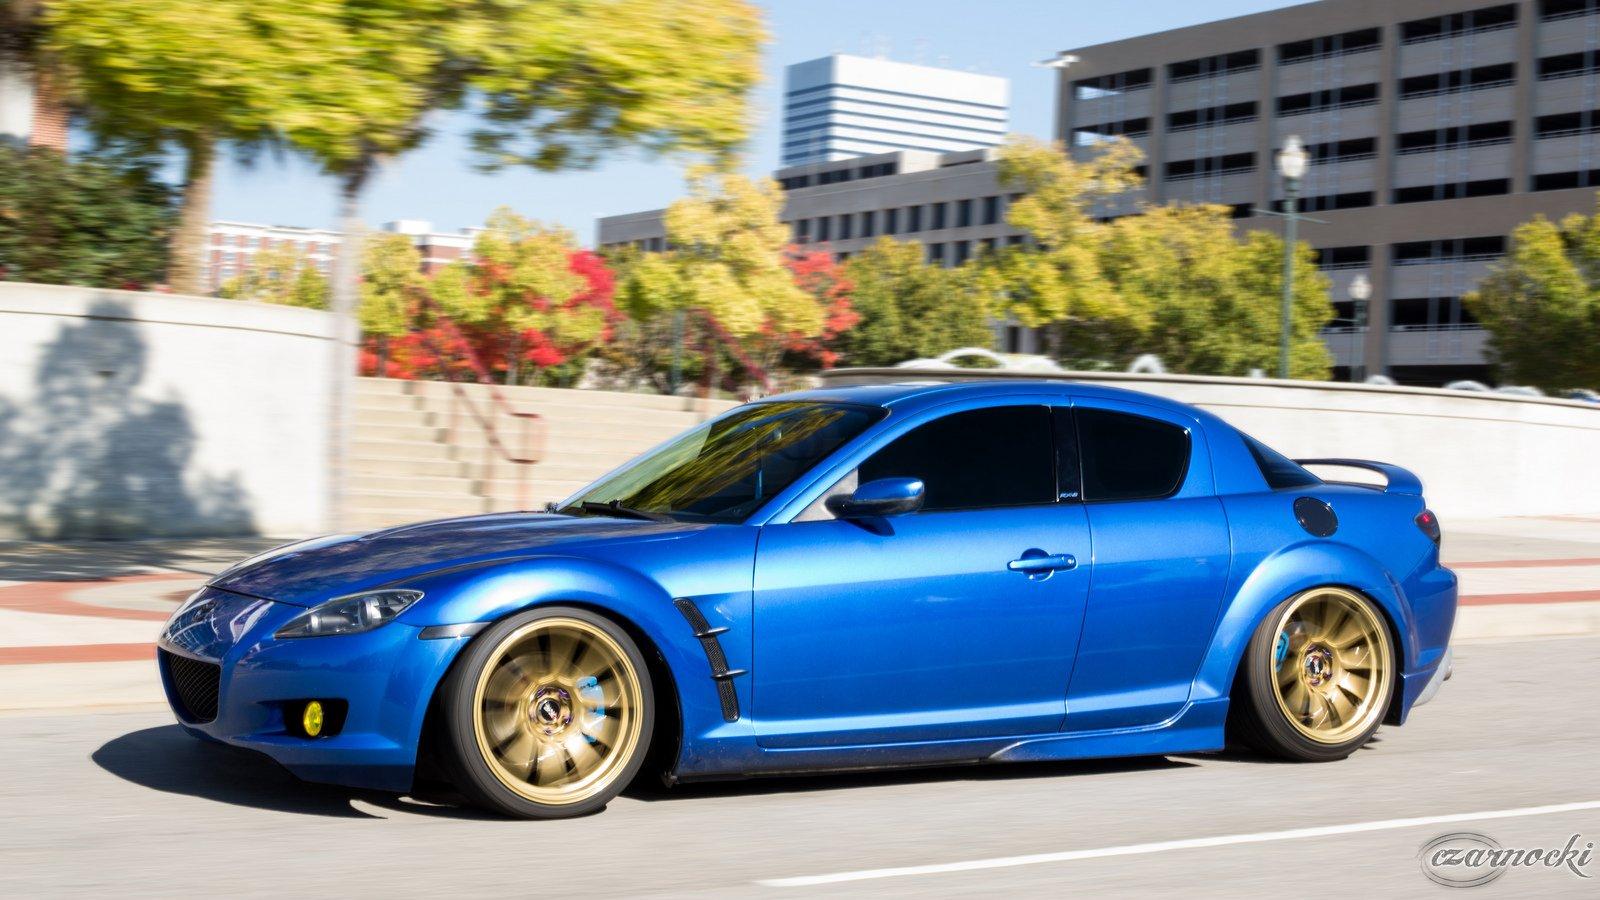 Mazda Rx8 Coupe Tuning Japan Body Kit Cars Wallpaper